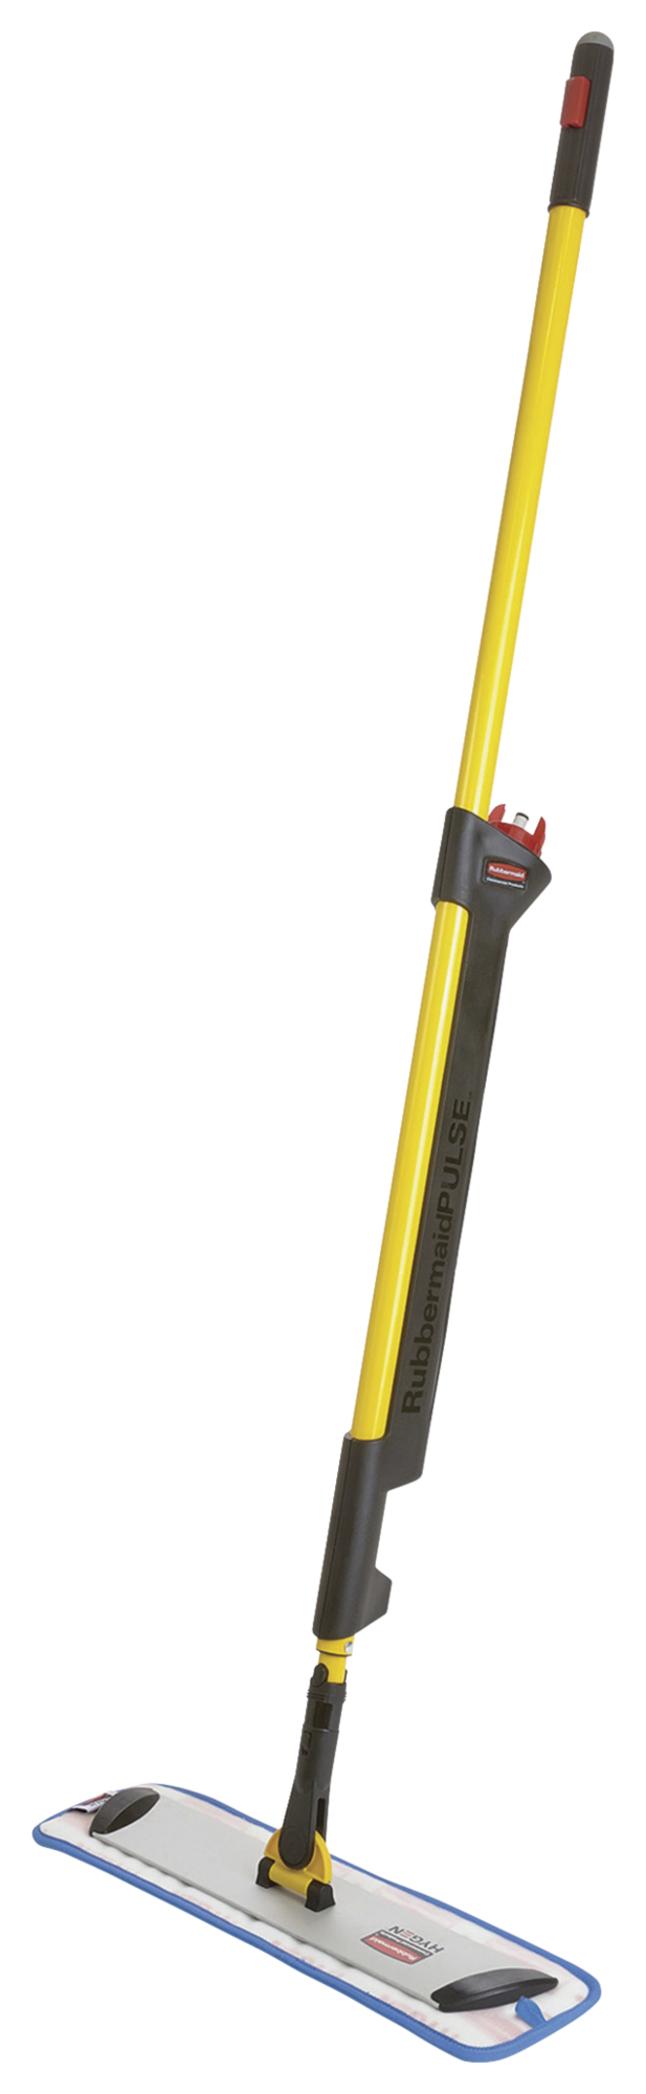 Mops, Brooms, Item Number 2009208